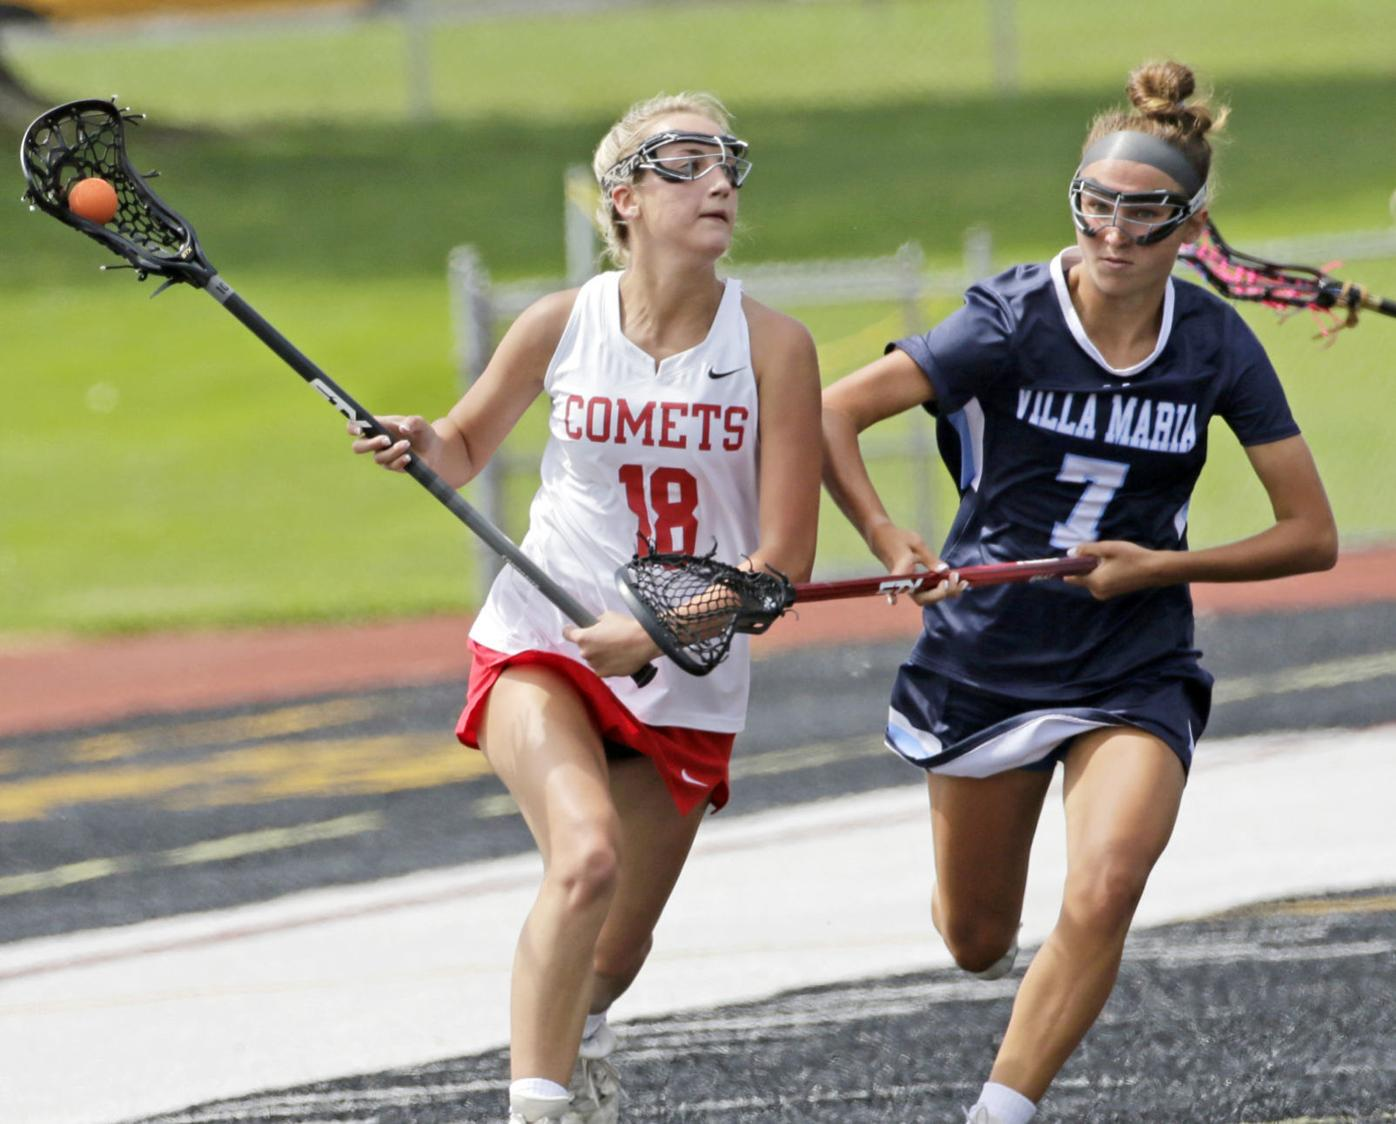 Crestwood falls to Villa Maria in PIAA girls lacrosse